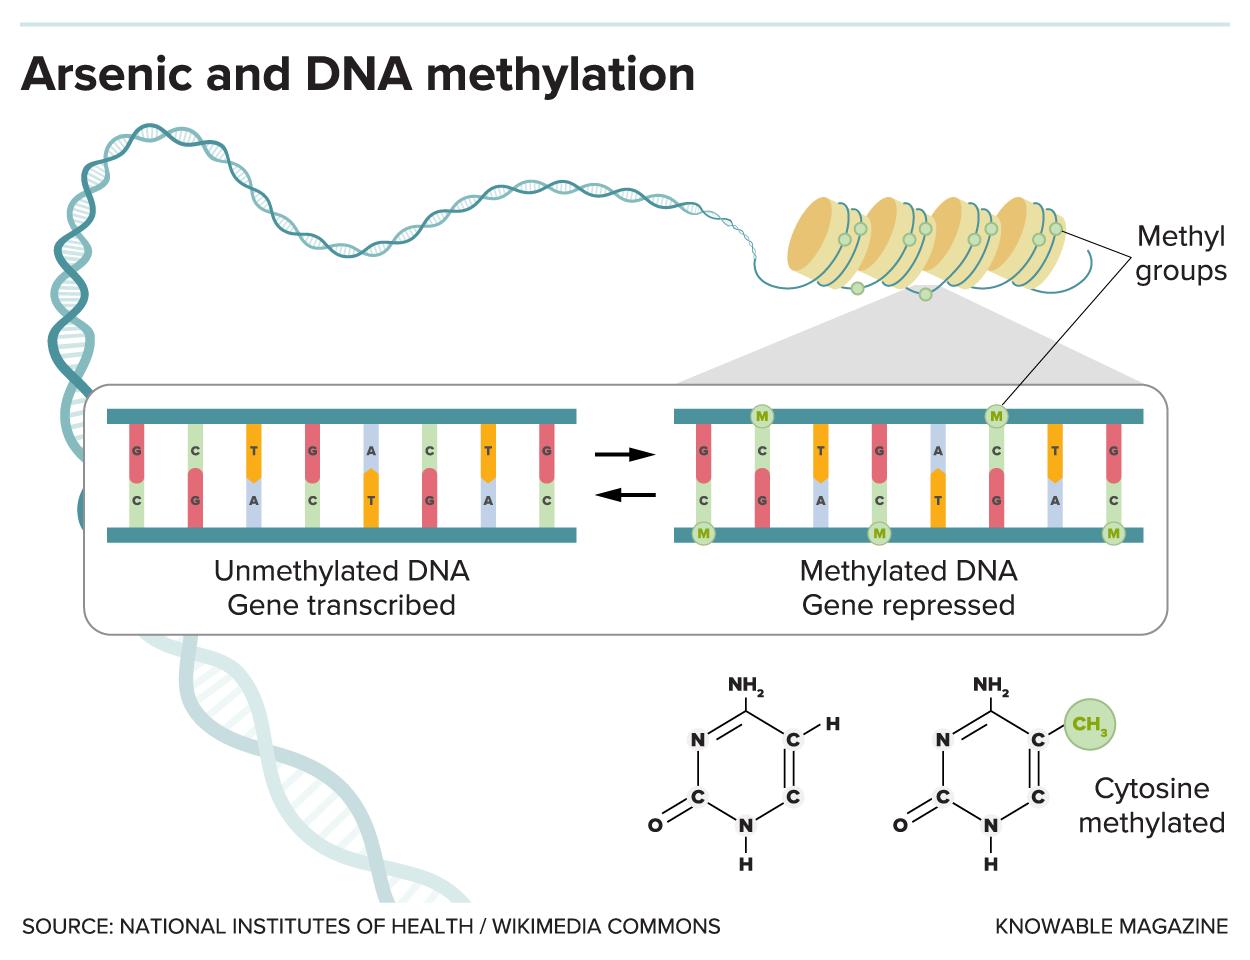 Arsenic and DNA methylation.